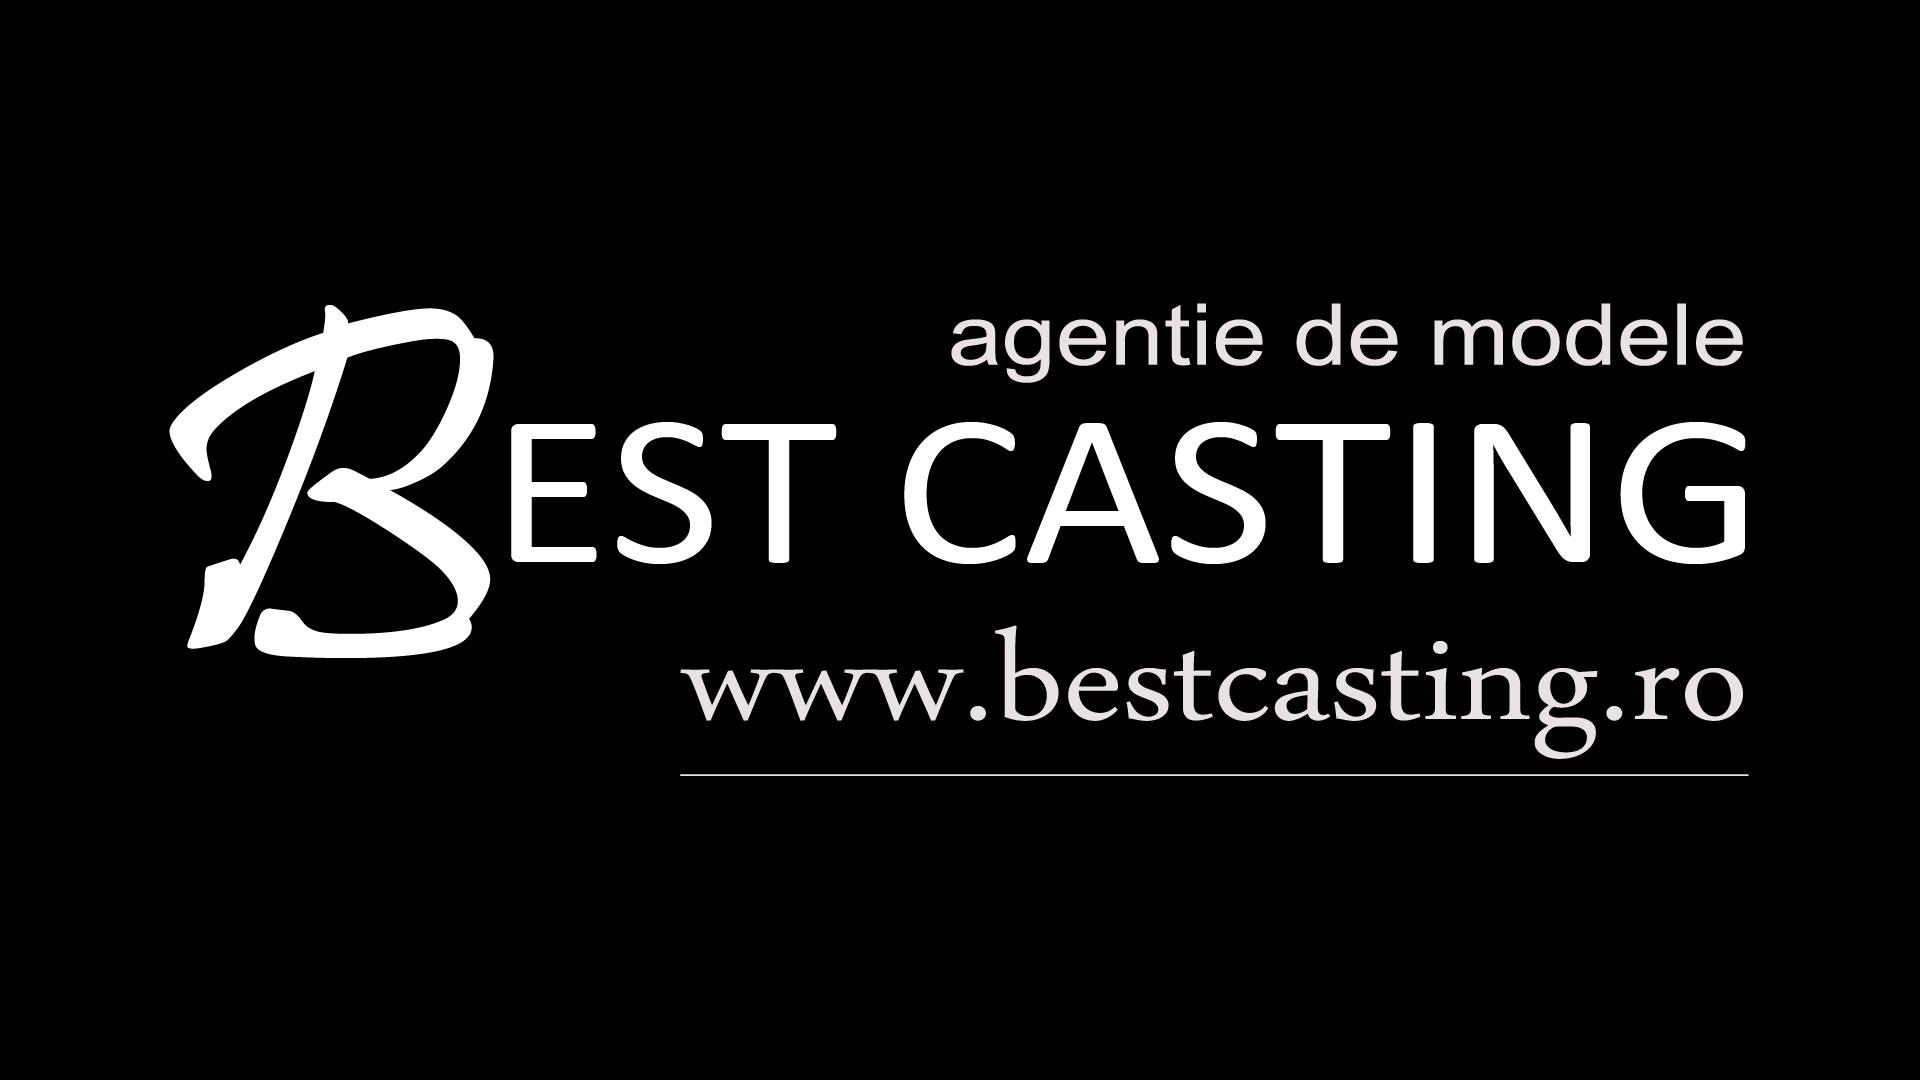 bestcasting_sigla_vectoriala_fullHD